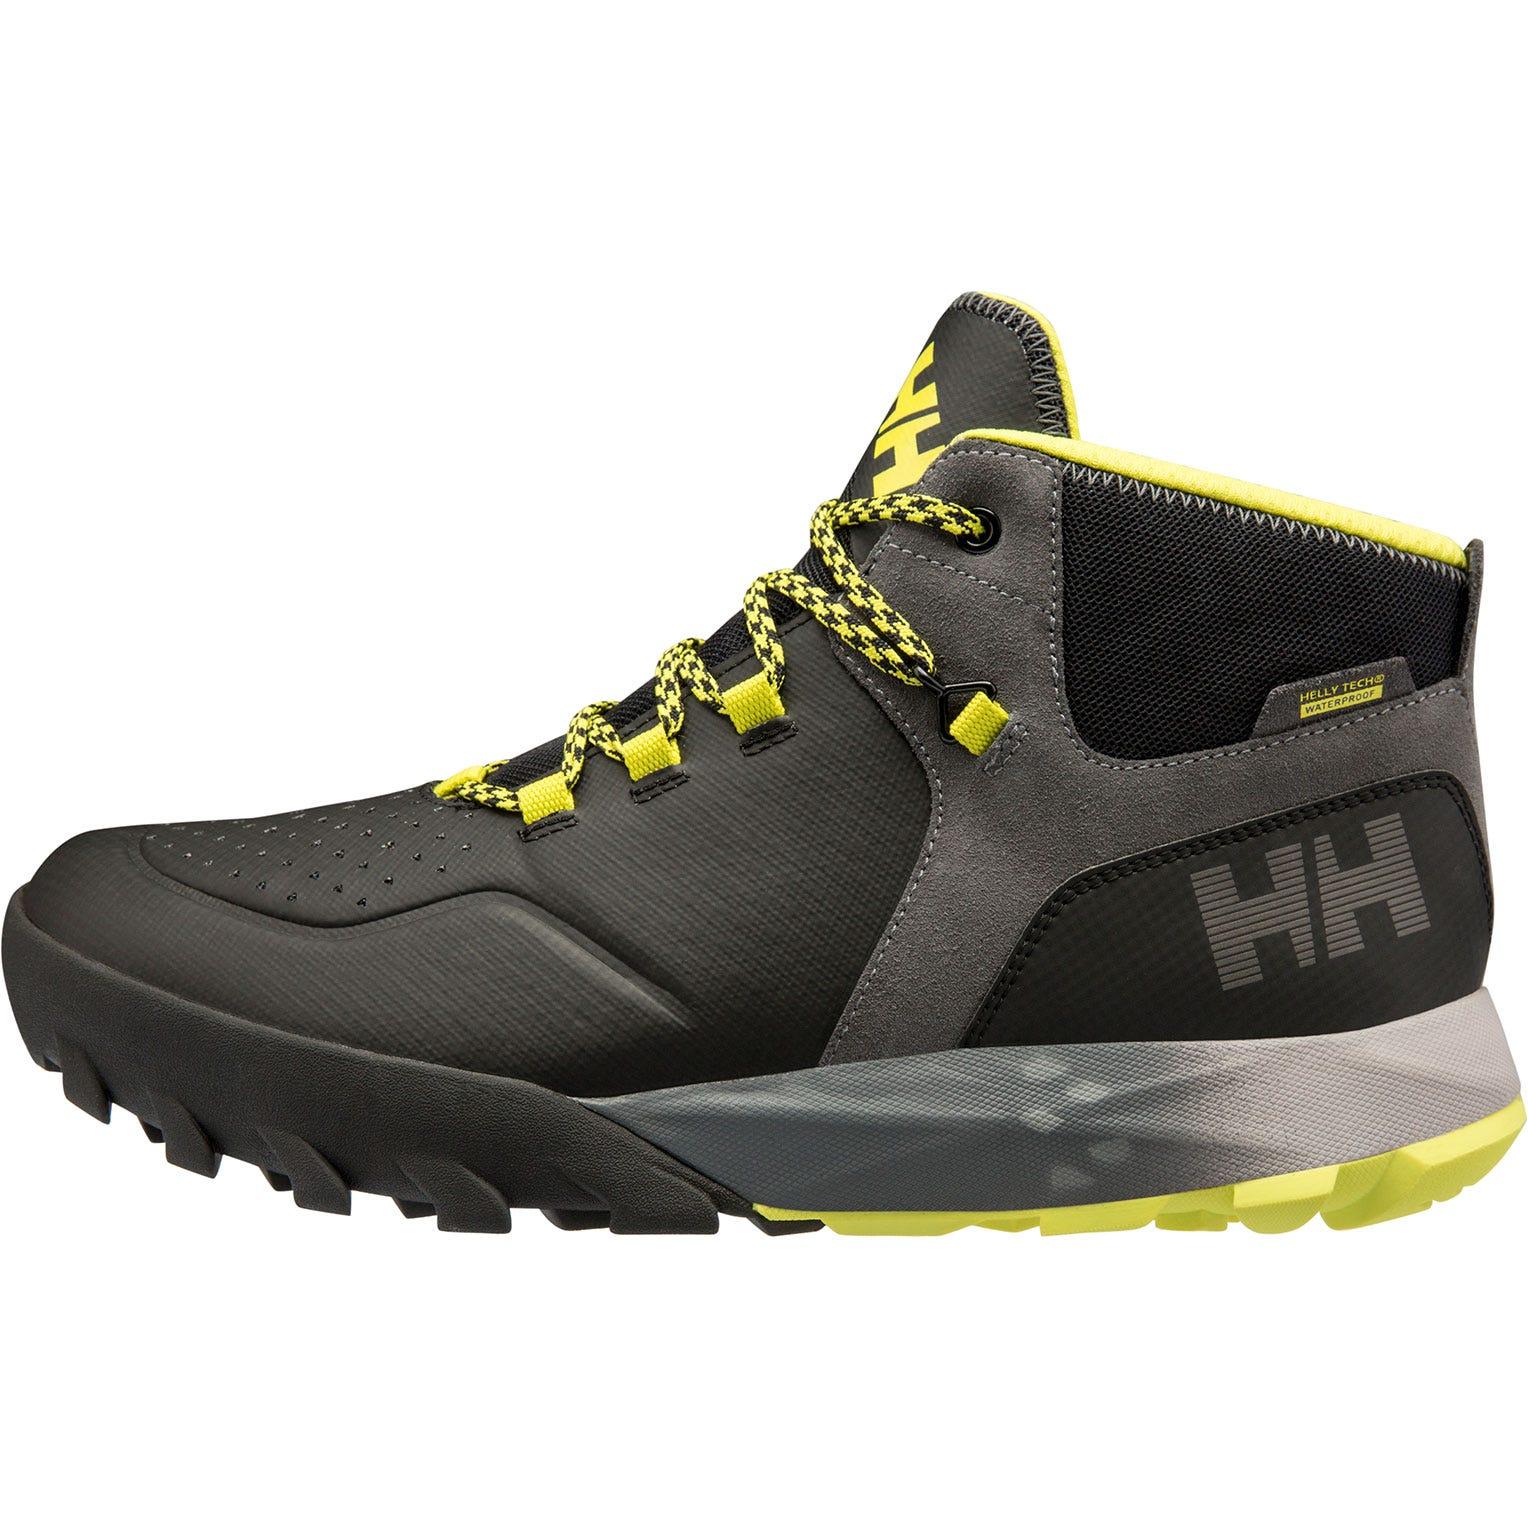 Helly Hansen Loke Rambler Ht Mens Hiking Boot Black 41/8